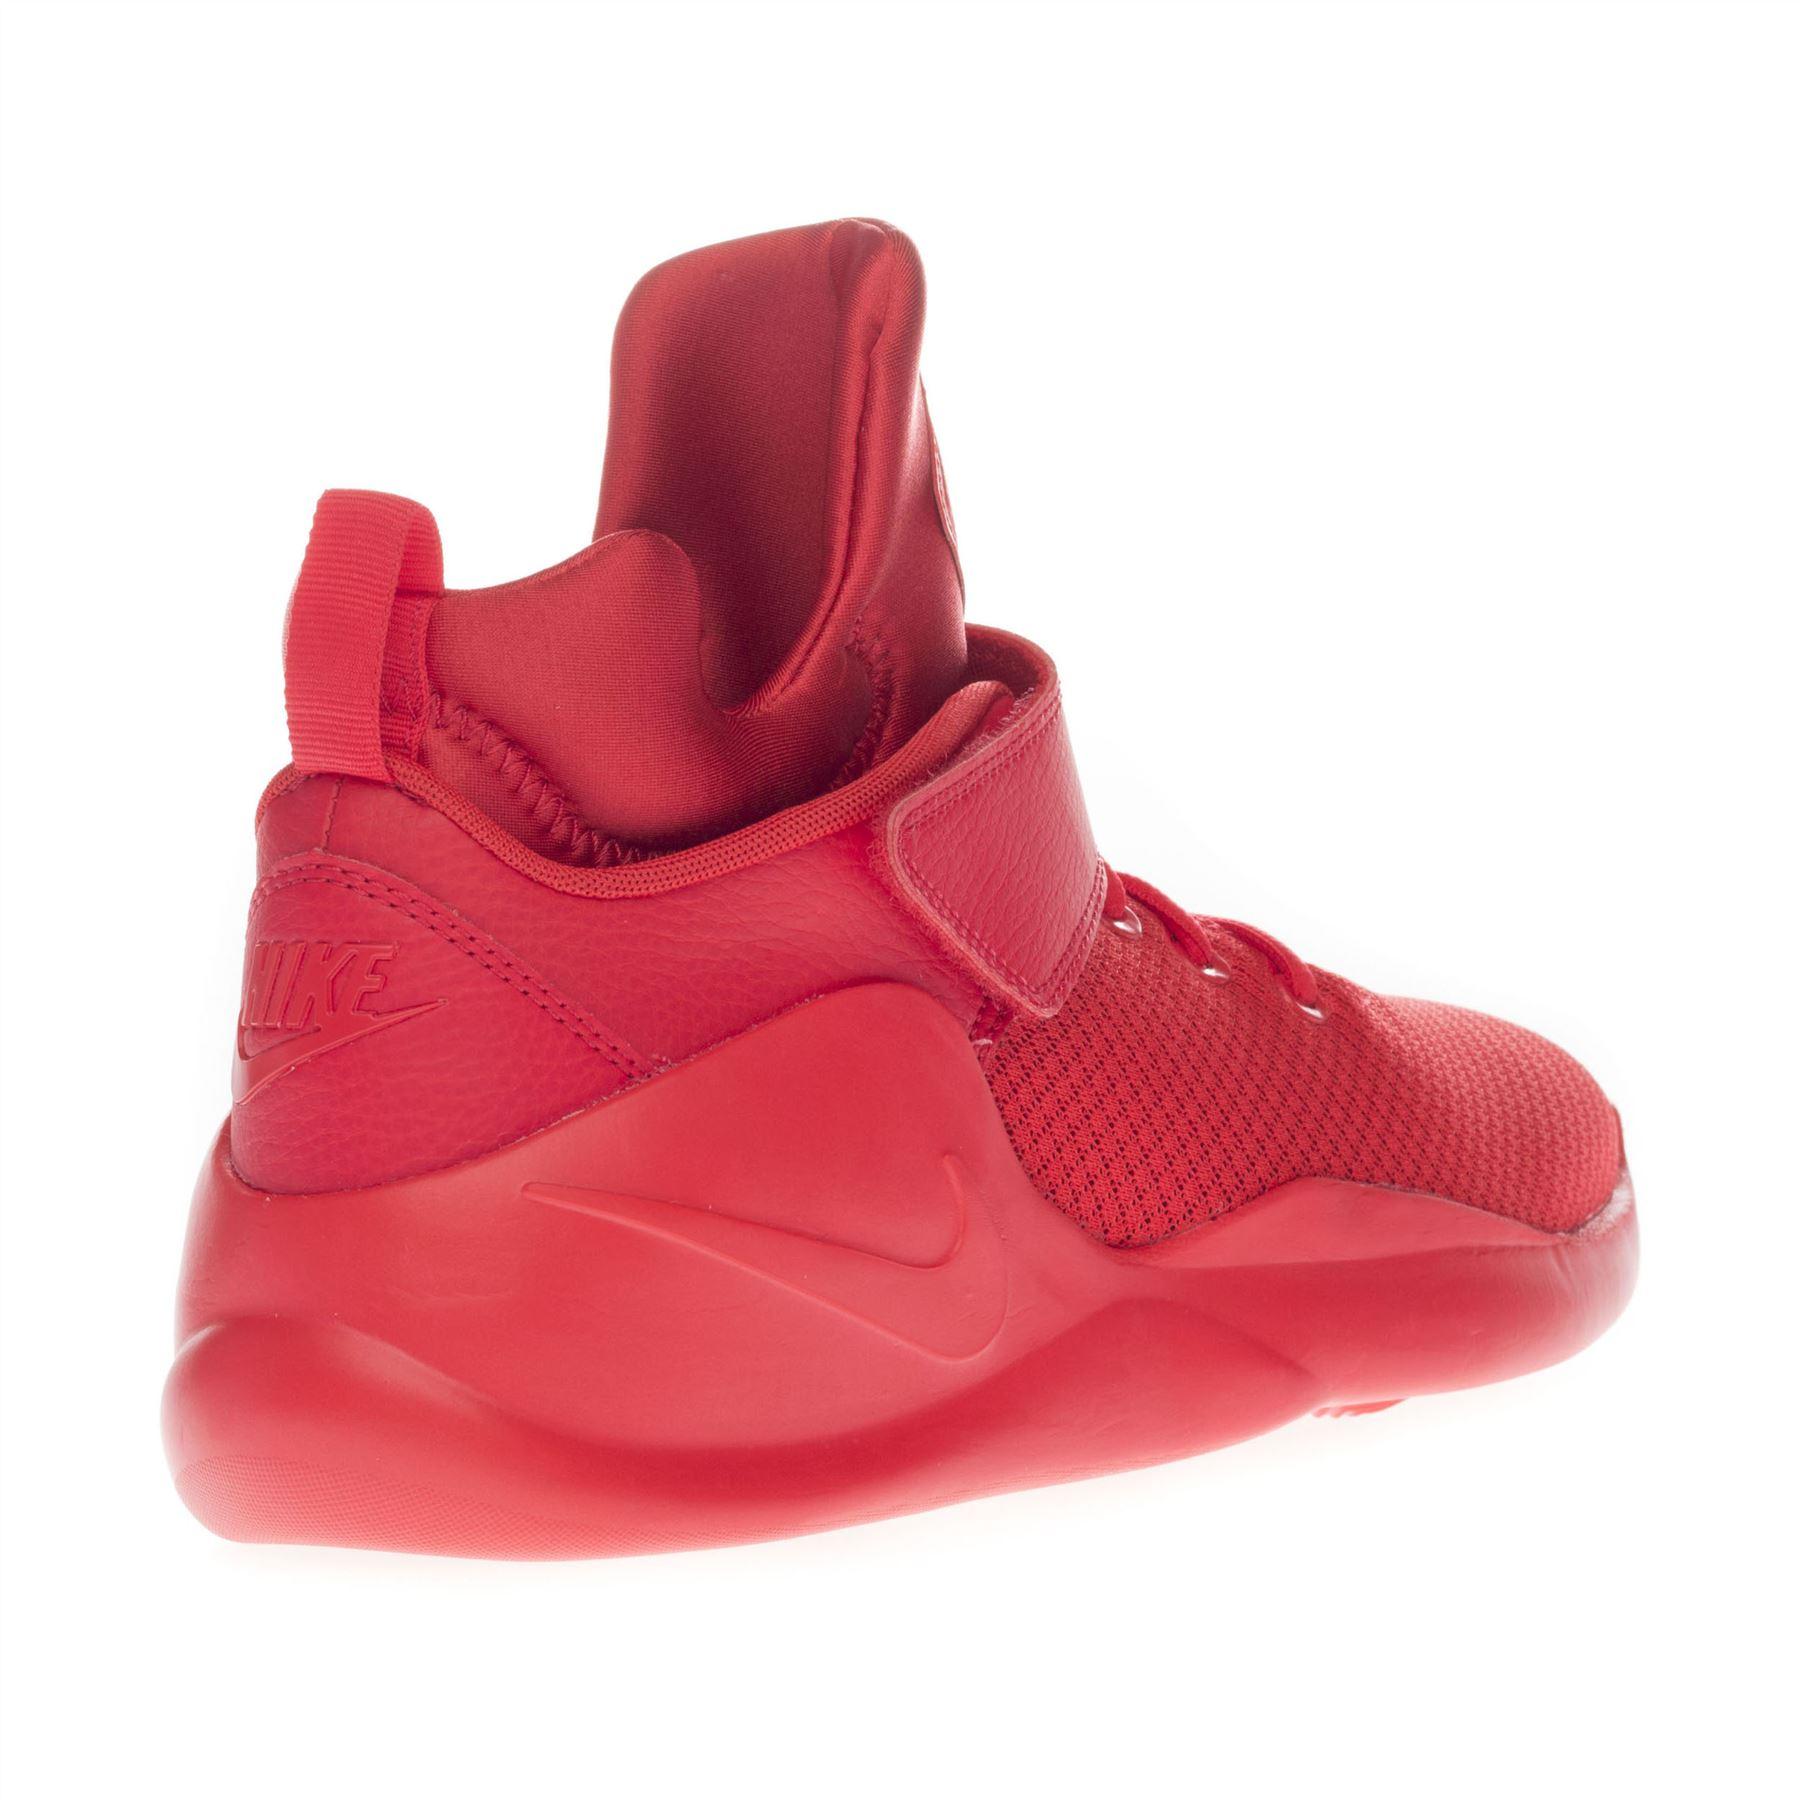 Nike Men s Kwazi Hi Top Active Running Gym Strap Lace Up Sports ... 2aa3982ac